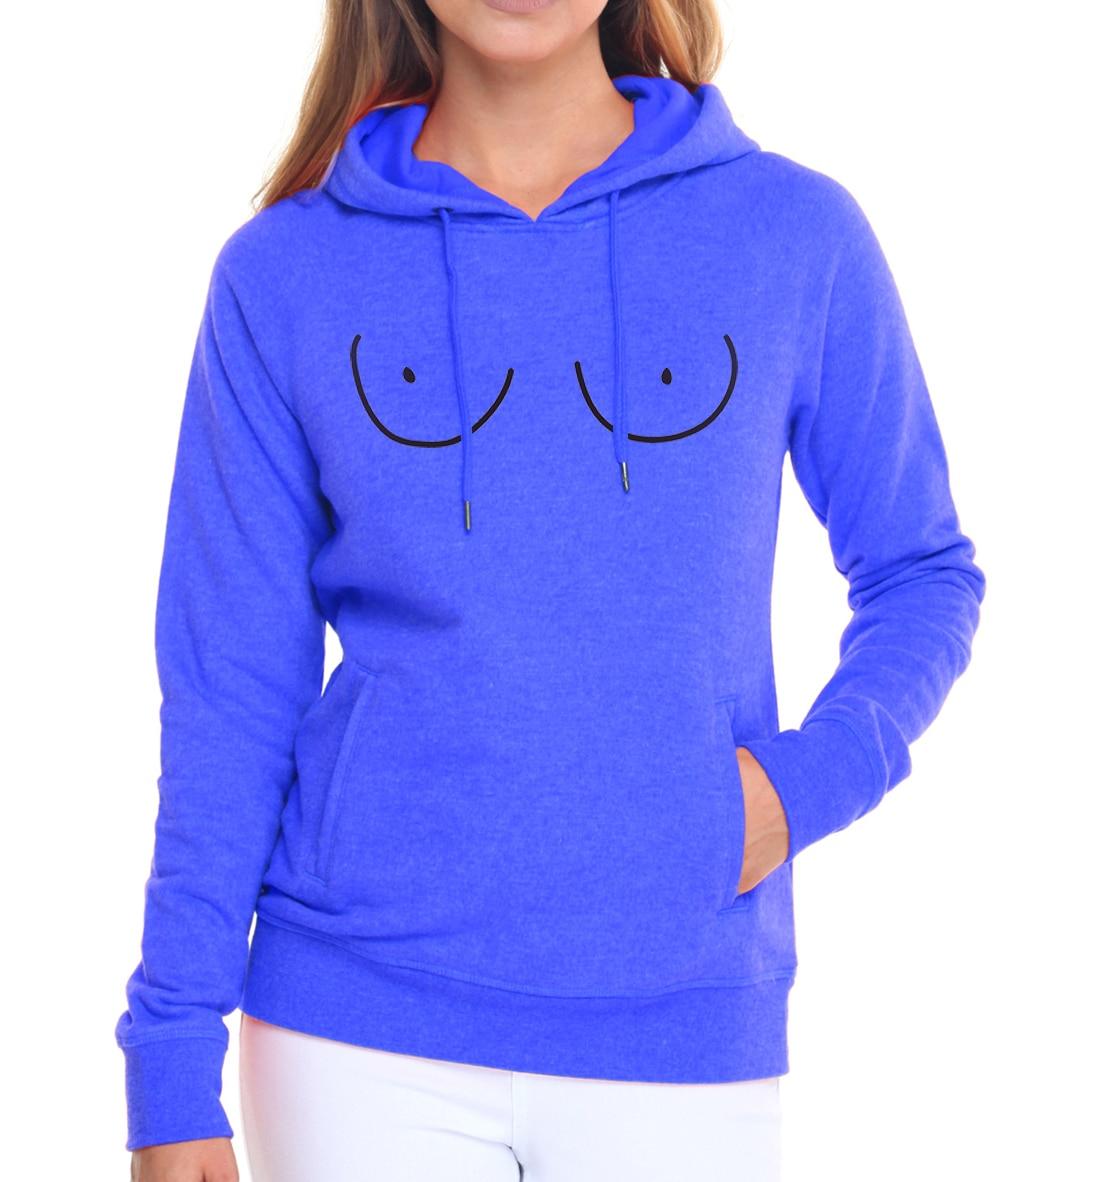 autumn winter long sleeve pullovers 2019 Women Funny harajuku sweatshirts female fashion hoody hoodies Hipster brand tracksuits